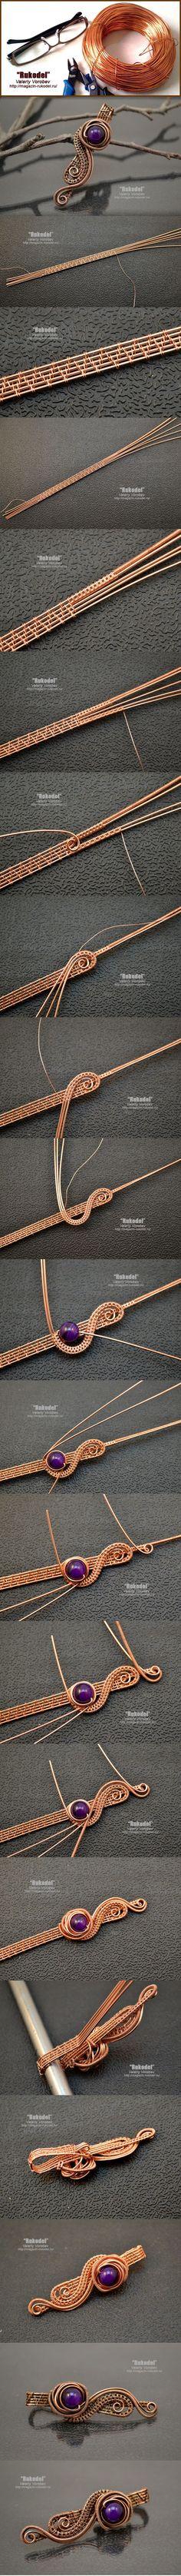 Pendant Wire - photo master class. Wire Wrap Pendant | Crafts